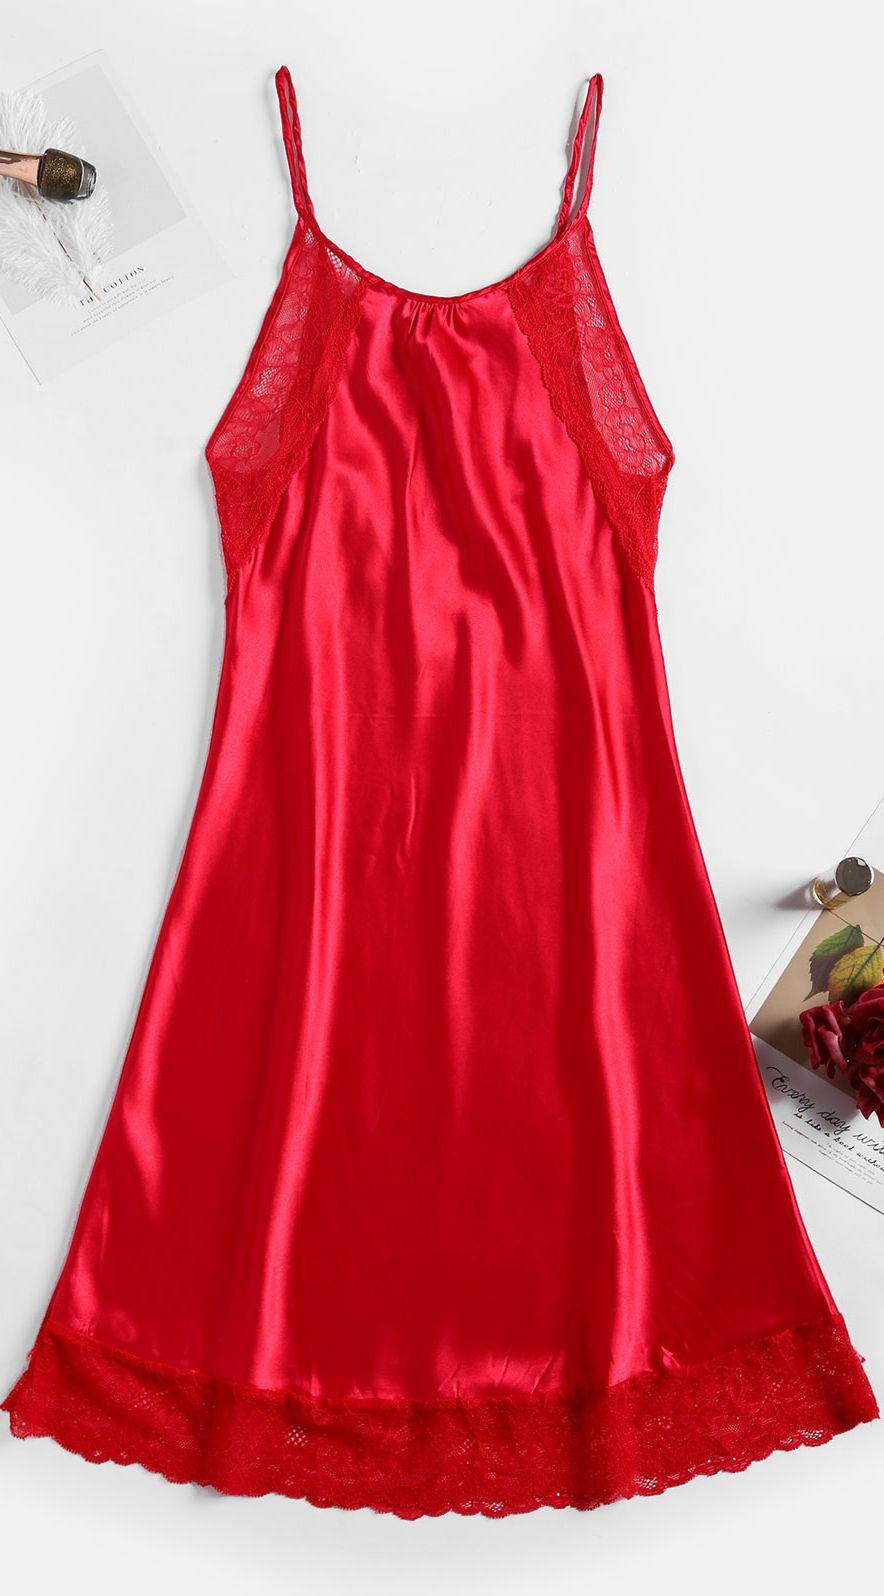 Floral Lace Criss Cross Satin Night Dress Lace Back Dresses Night Dress Summer Dresses For Women [ 1596 x 884 Pixel ]